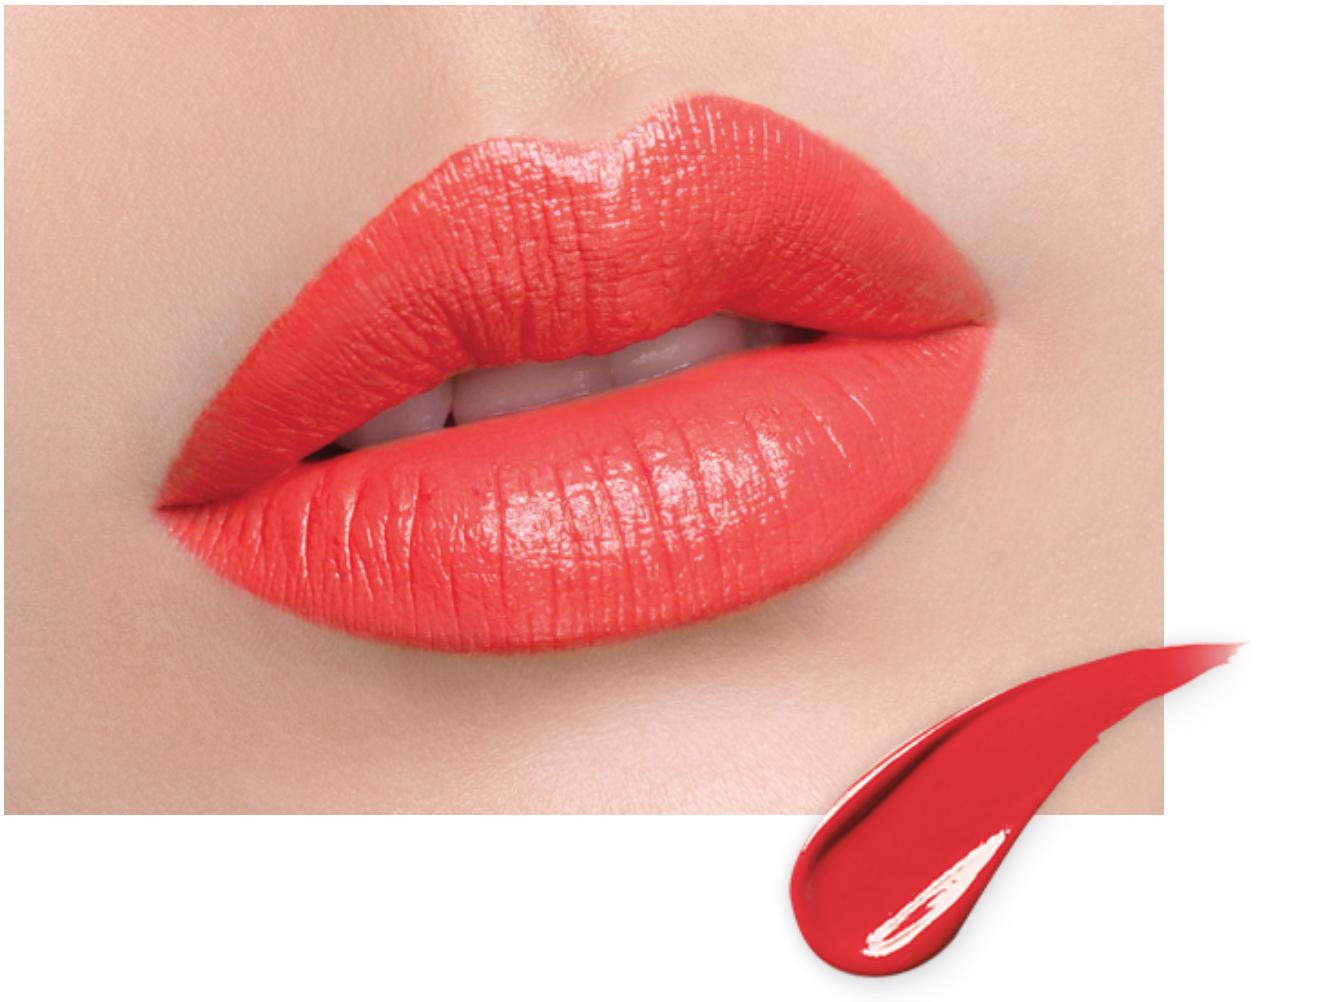 laneige-silk-intense-lipstick-232.png